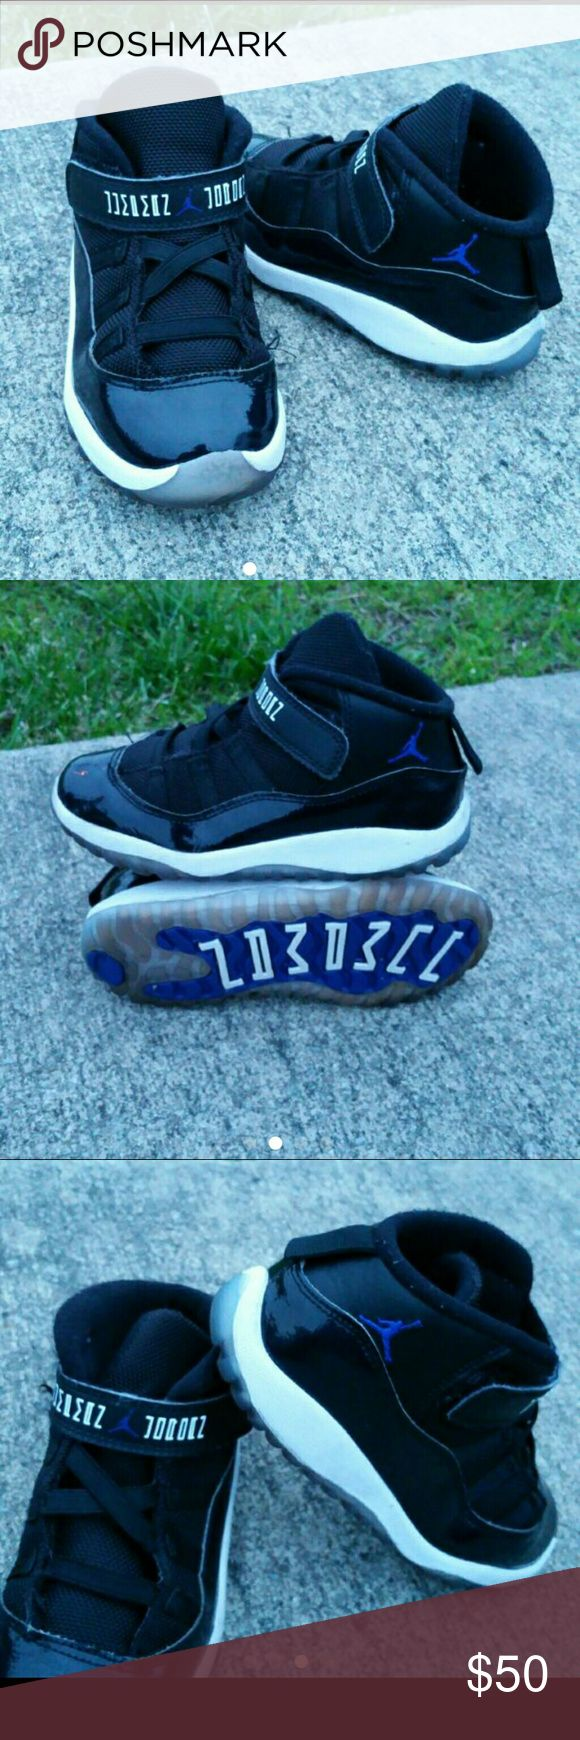 AIR JORDAN 11 RETRO KIDS SHOES VERY CLEAN INSIDE-OUT   TODDLER SIZE 10C   SKE # BV Air Jordan Shoes Sneakers